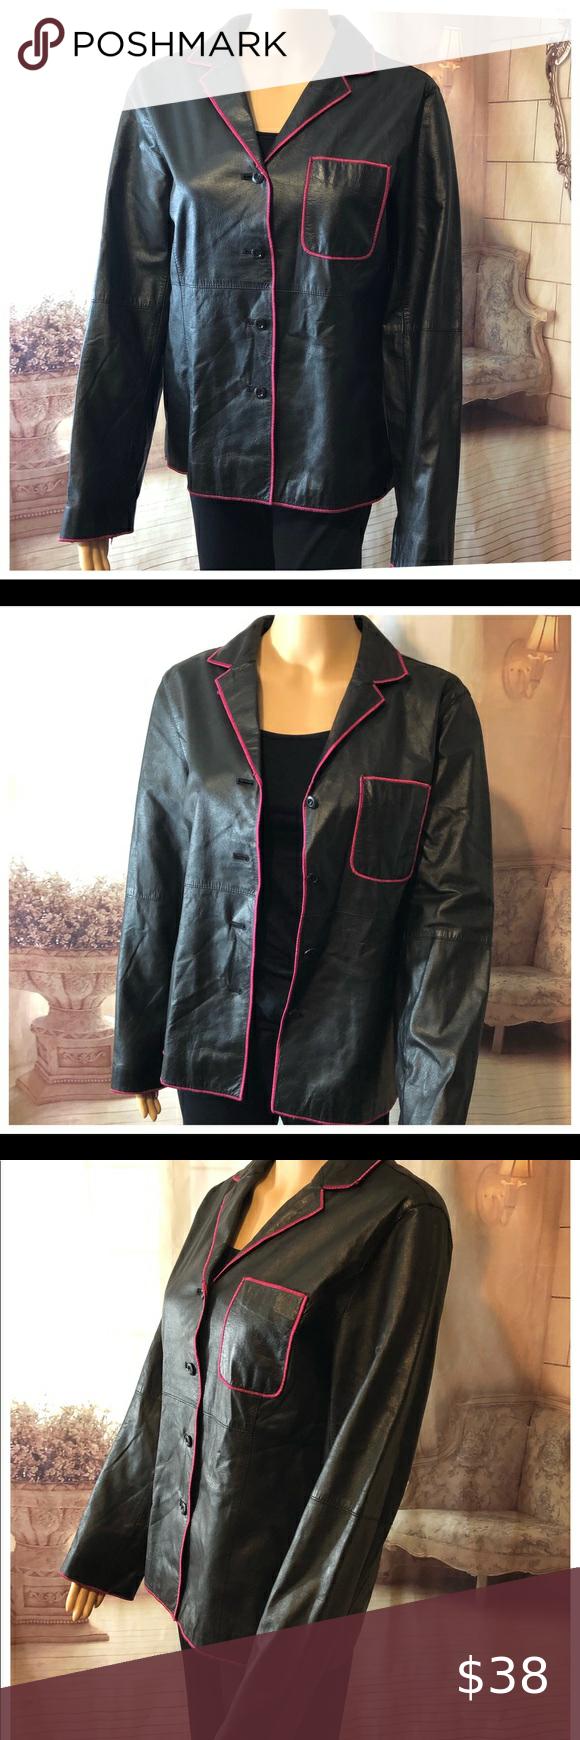 Classiques Entier Jacket Leather Jacket Jackets Jackets For Women